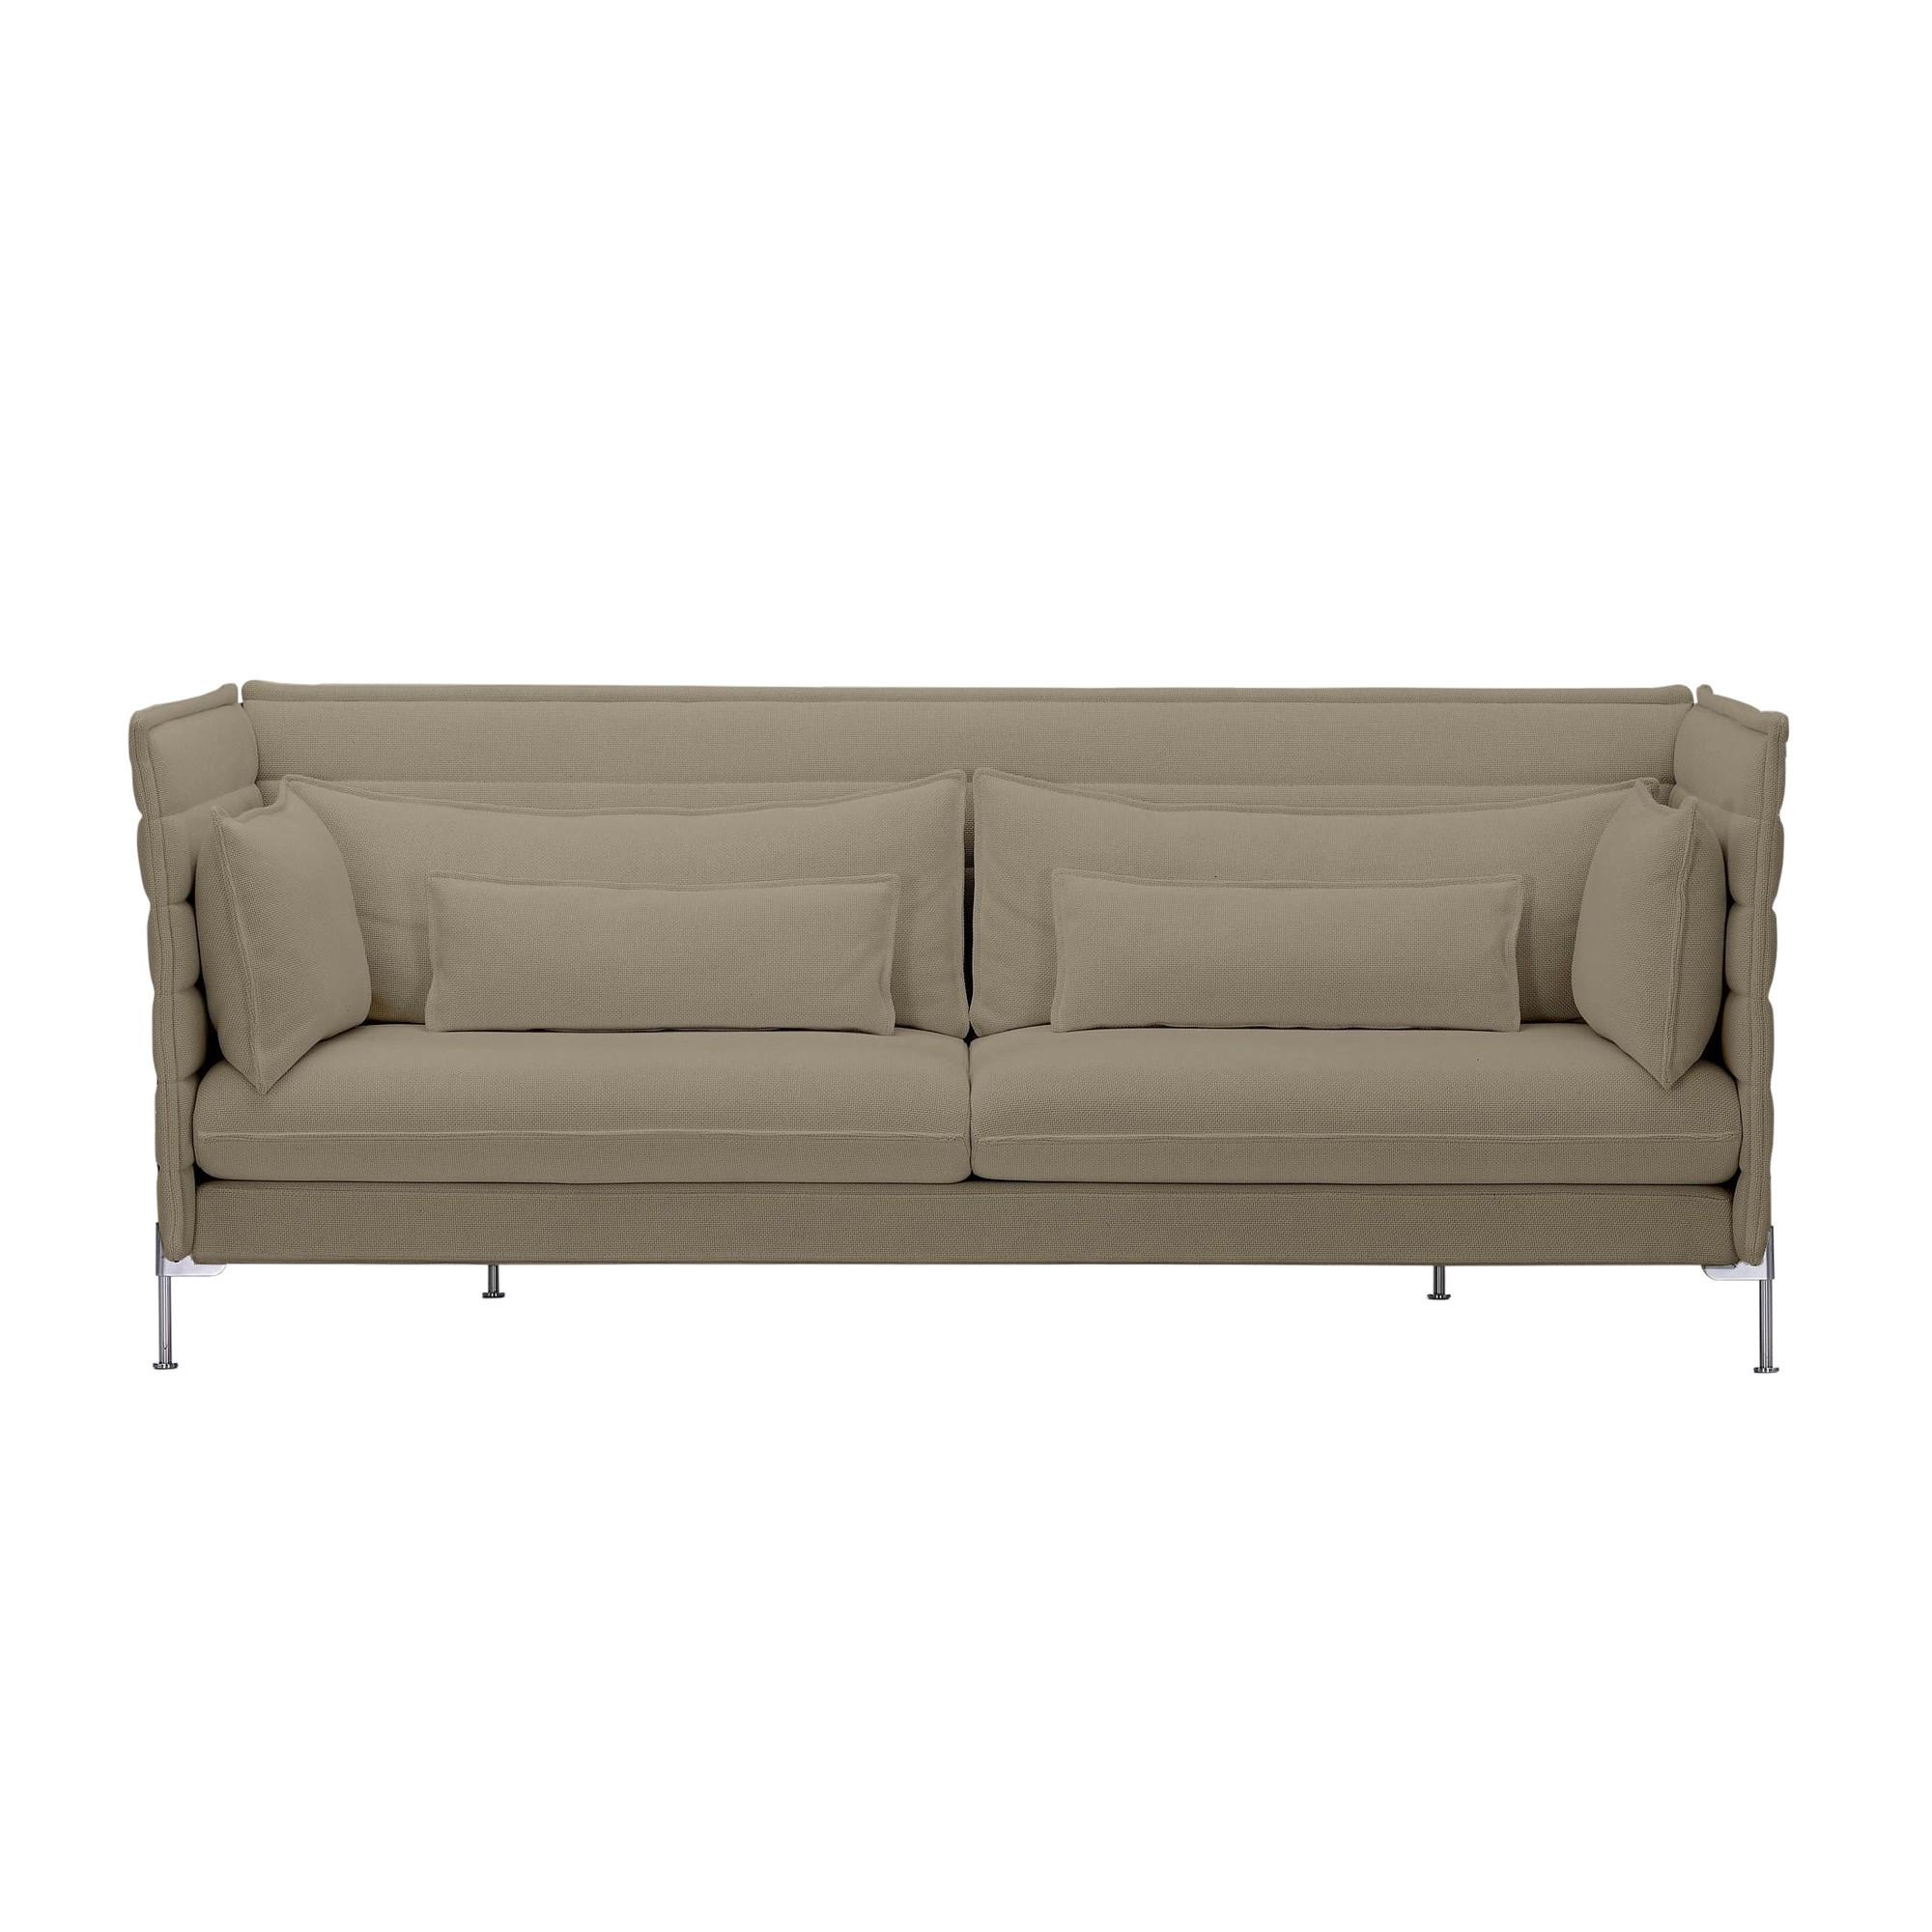 Vitra Alcove Bouroullec 3 Seater Sofa Warm Grey Frame Chrome Fabric